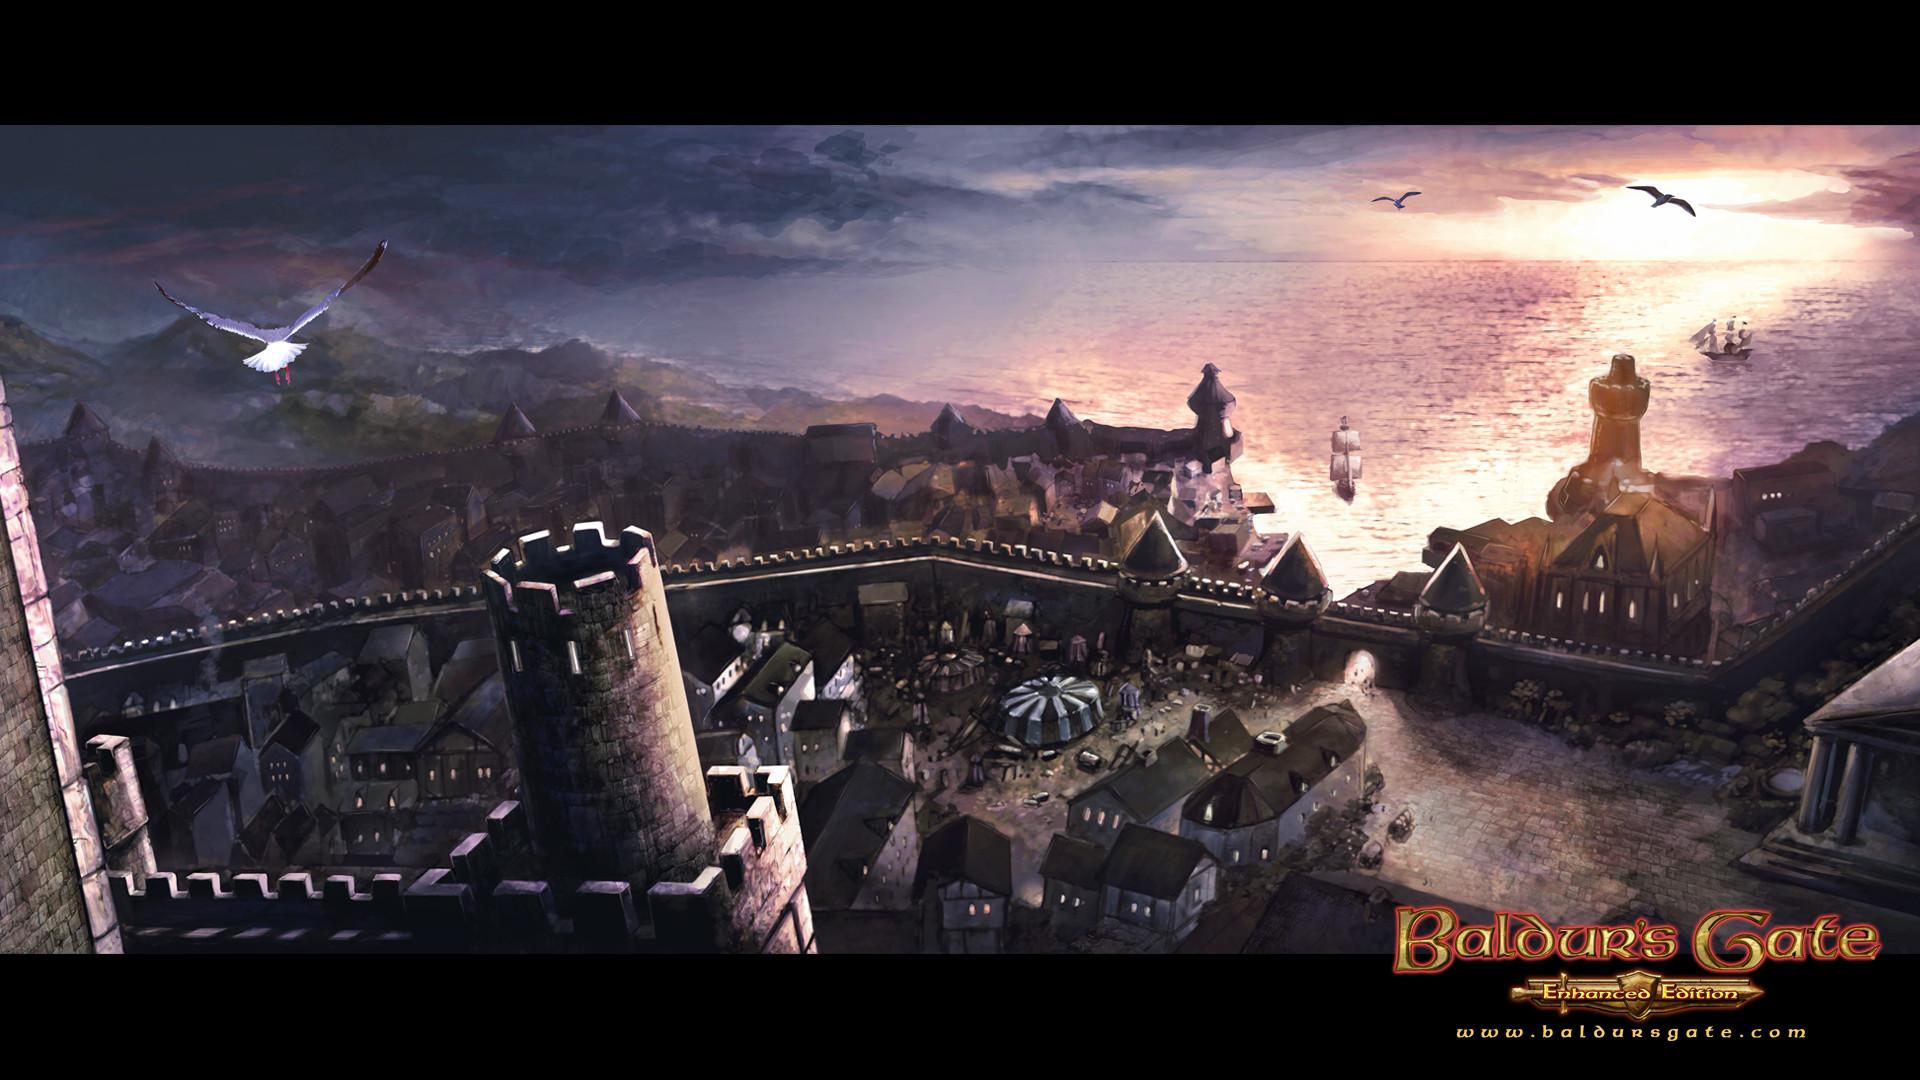 Baldurs Gate Full HD Wallpaper 1920×1080